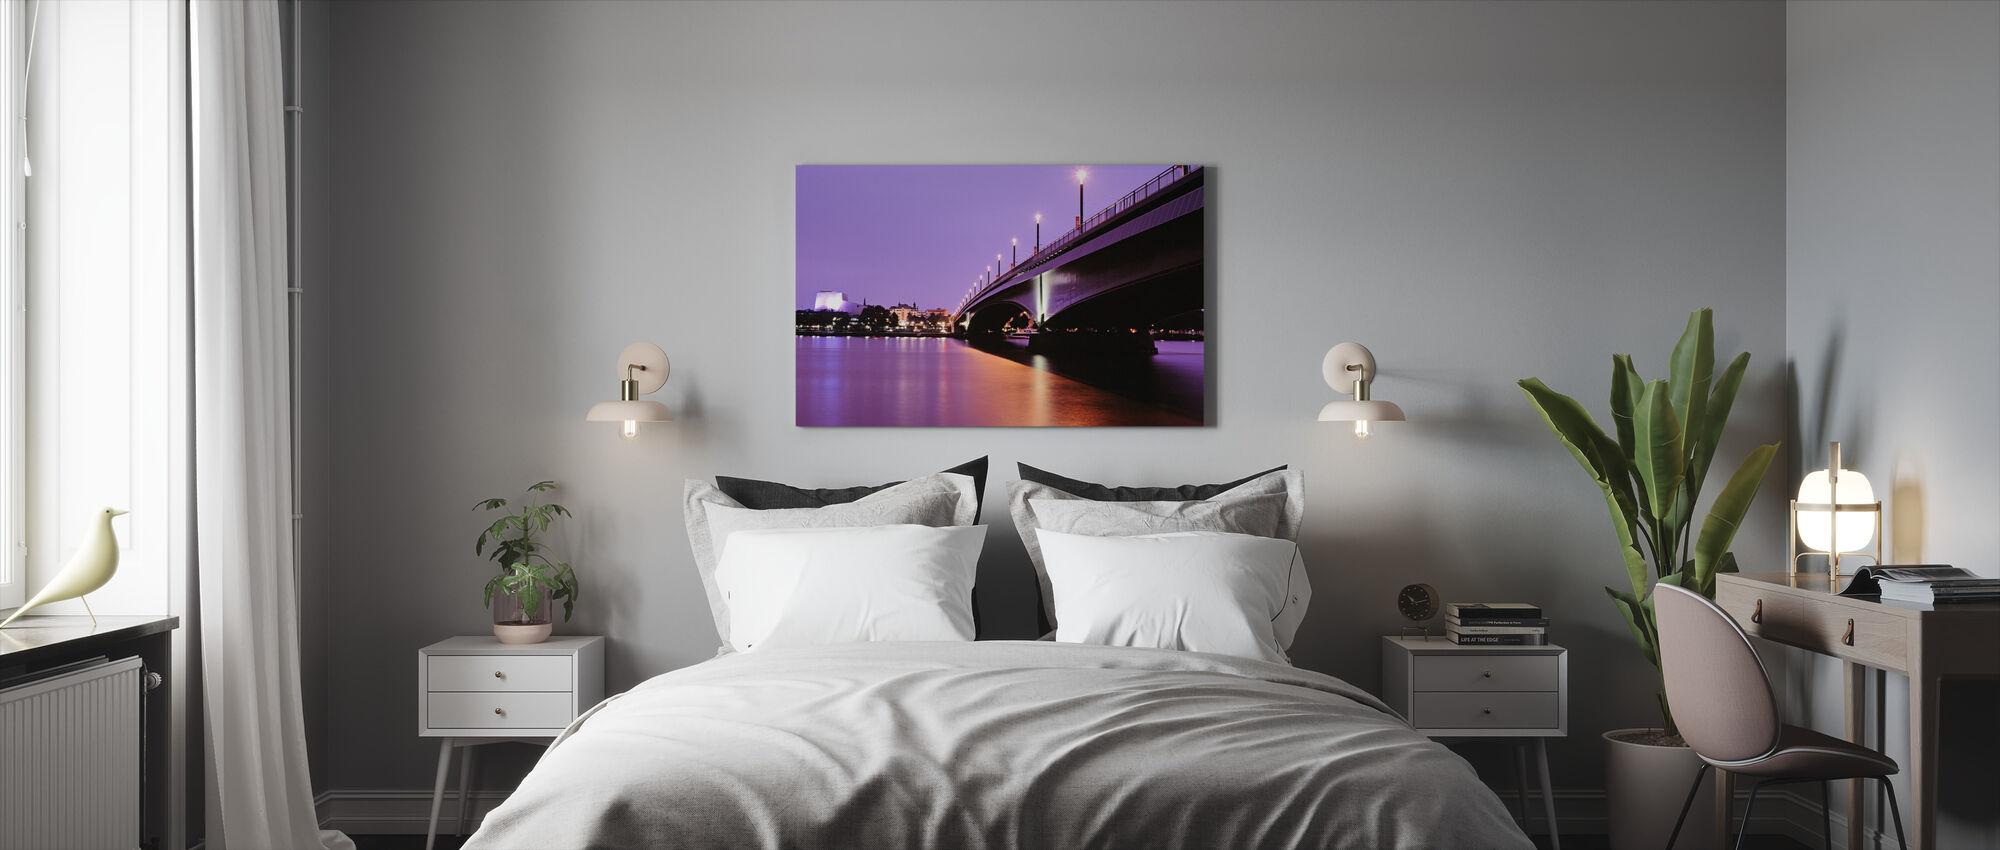 Kennedy-brug over de Rijn - Canvas print - Slaapkamer